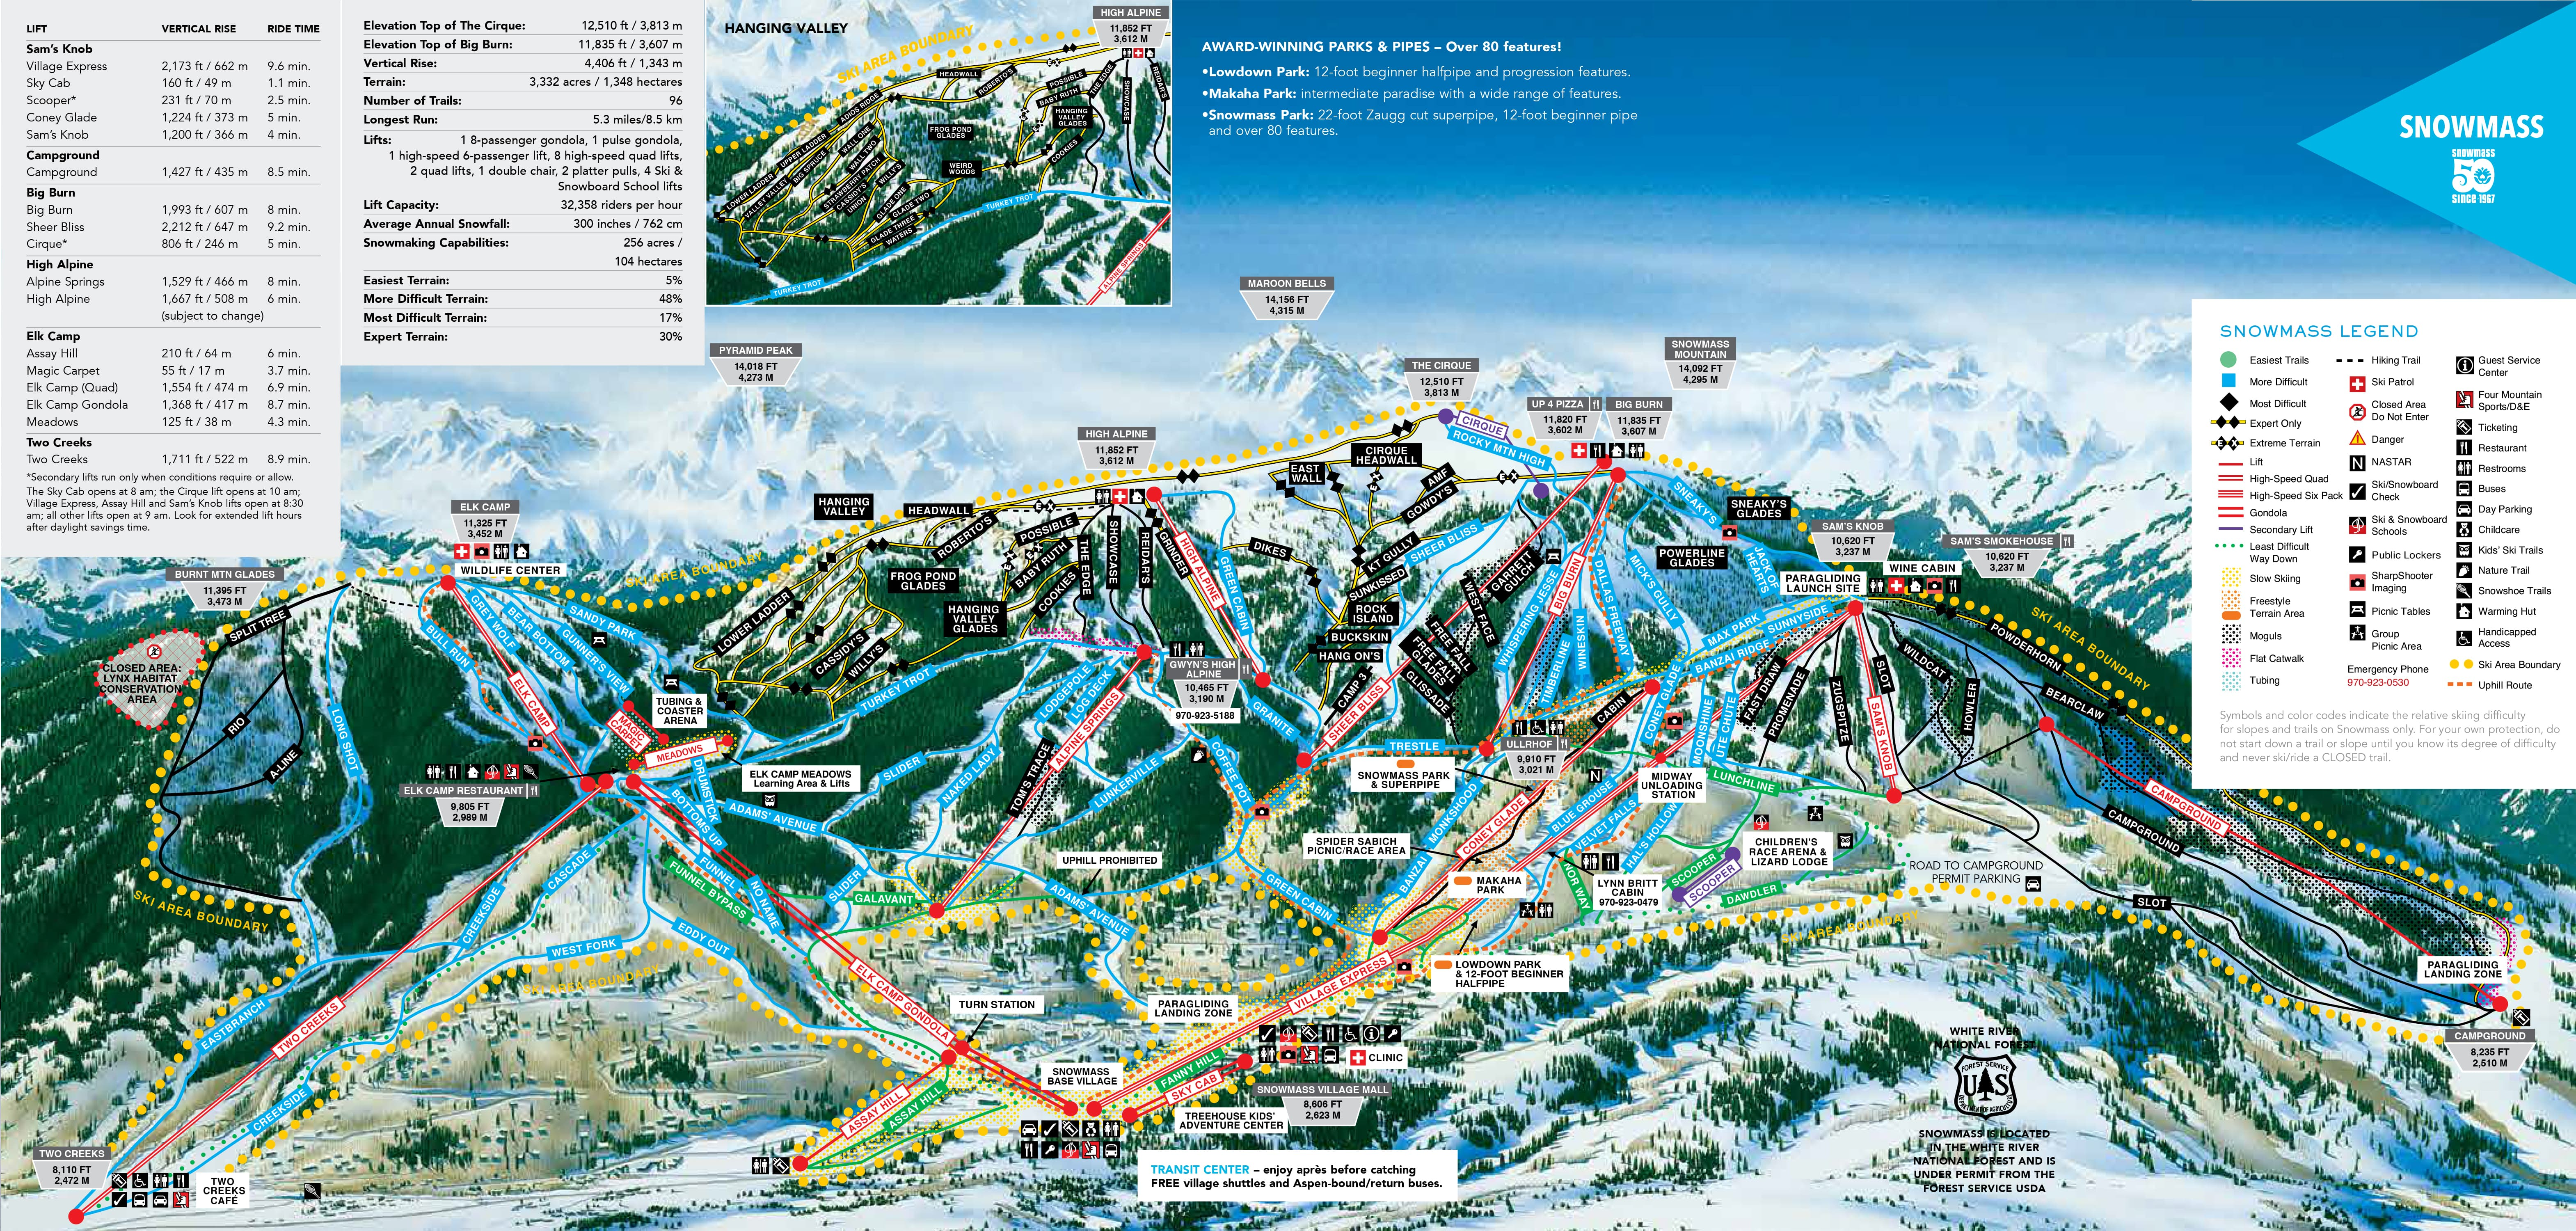 Aspen Snowm Ski Trail Map Free Download on